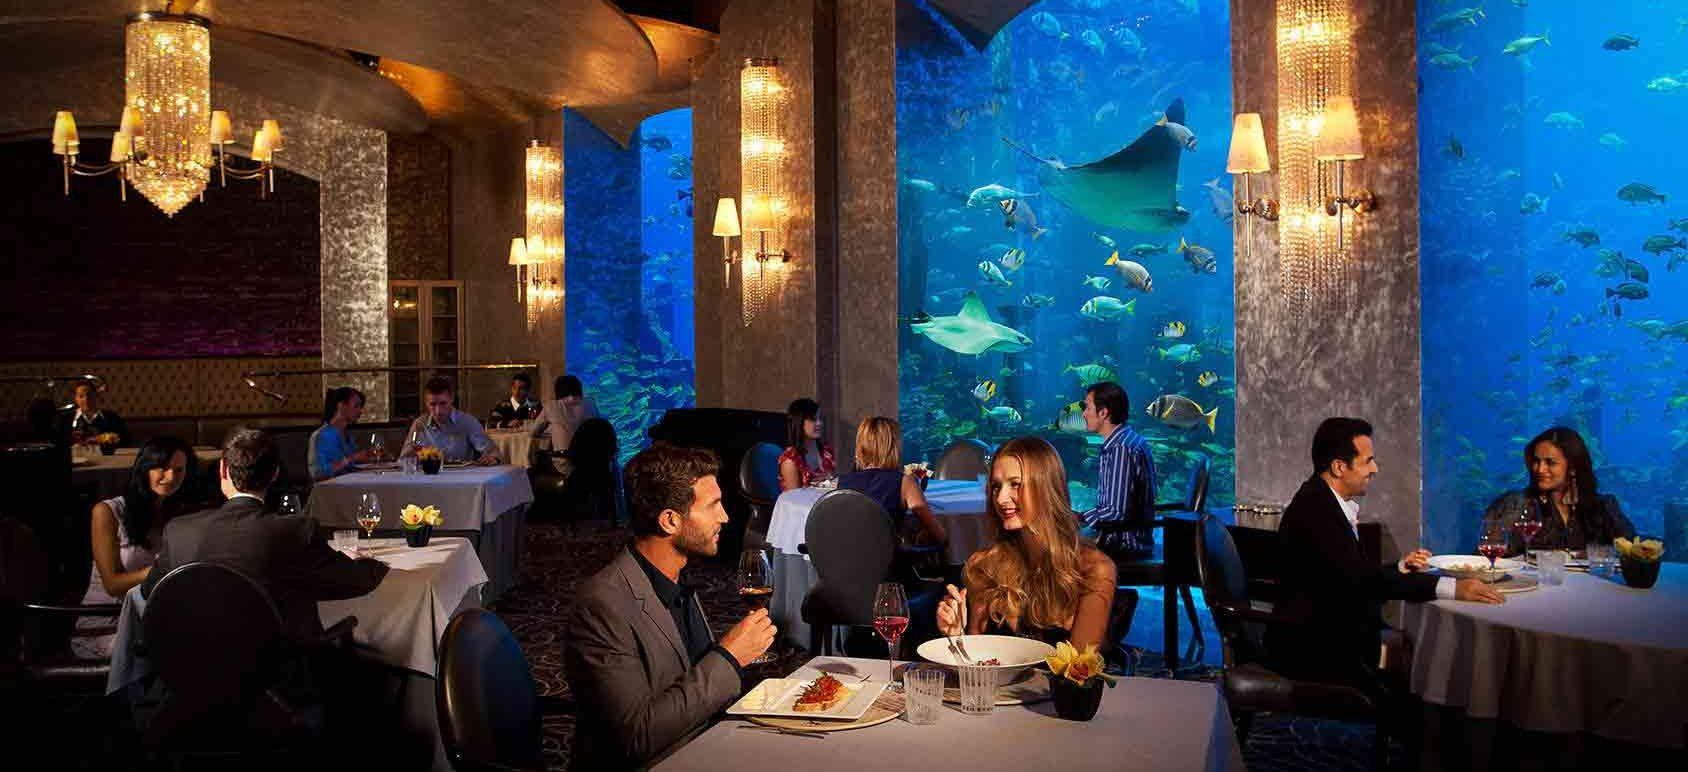 Pepper crab in Dubai